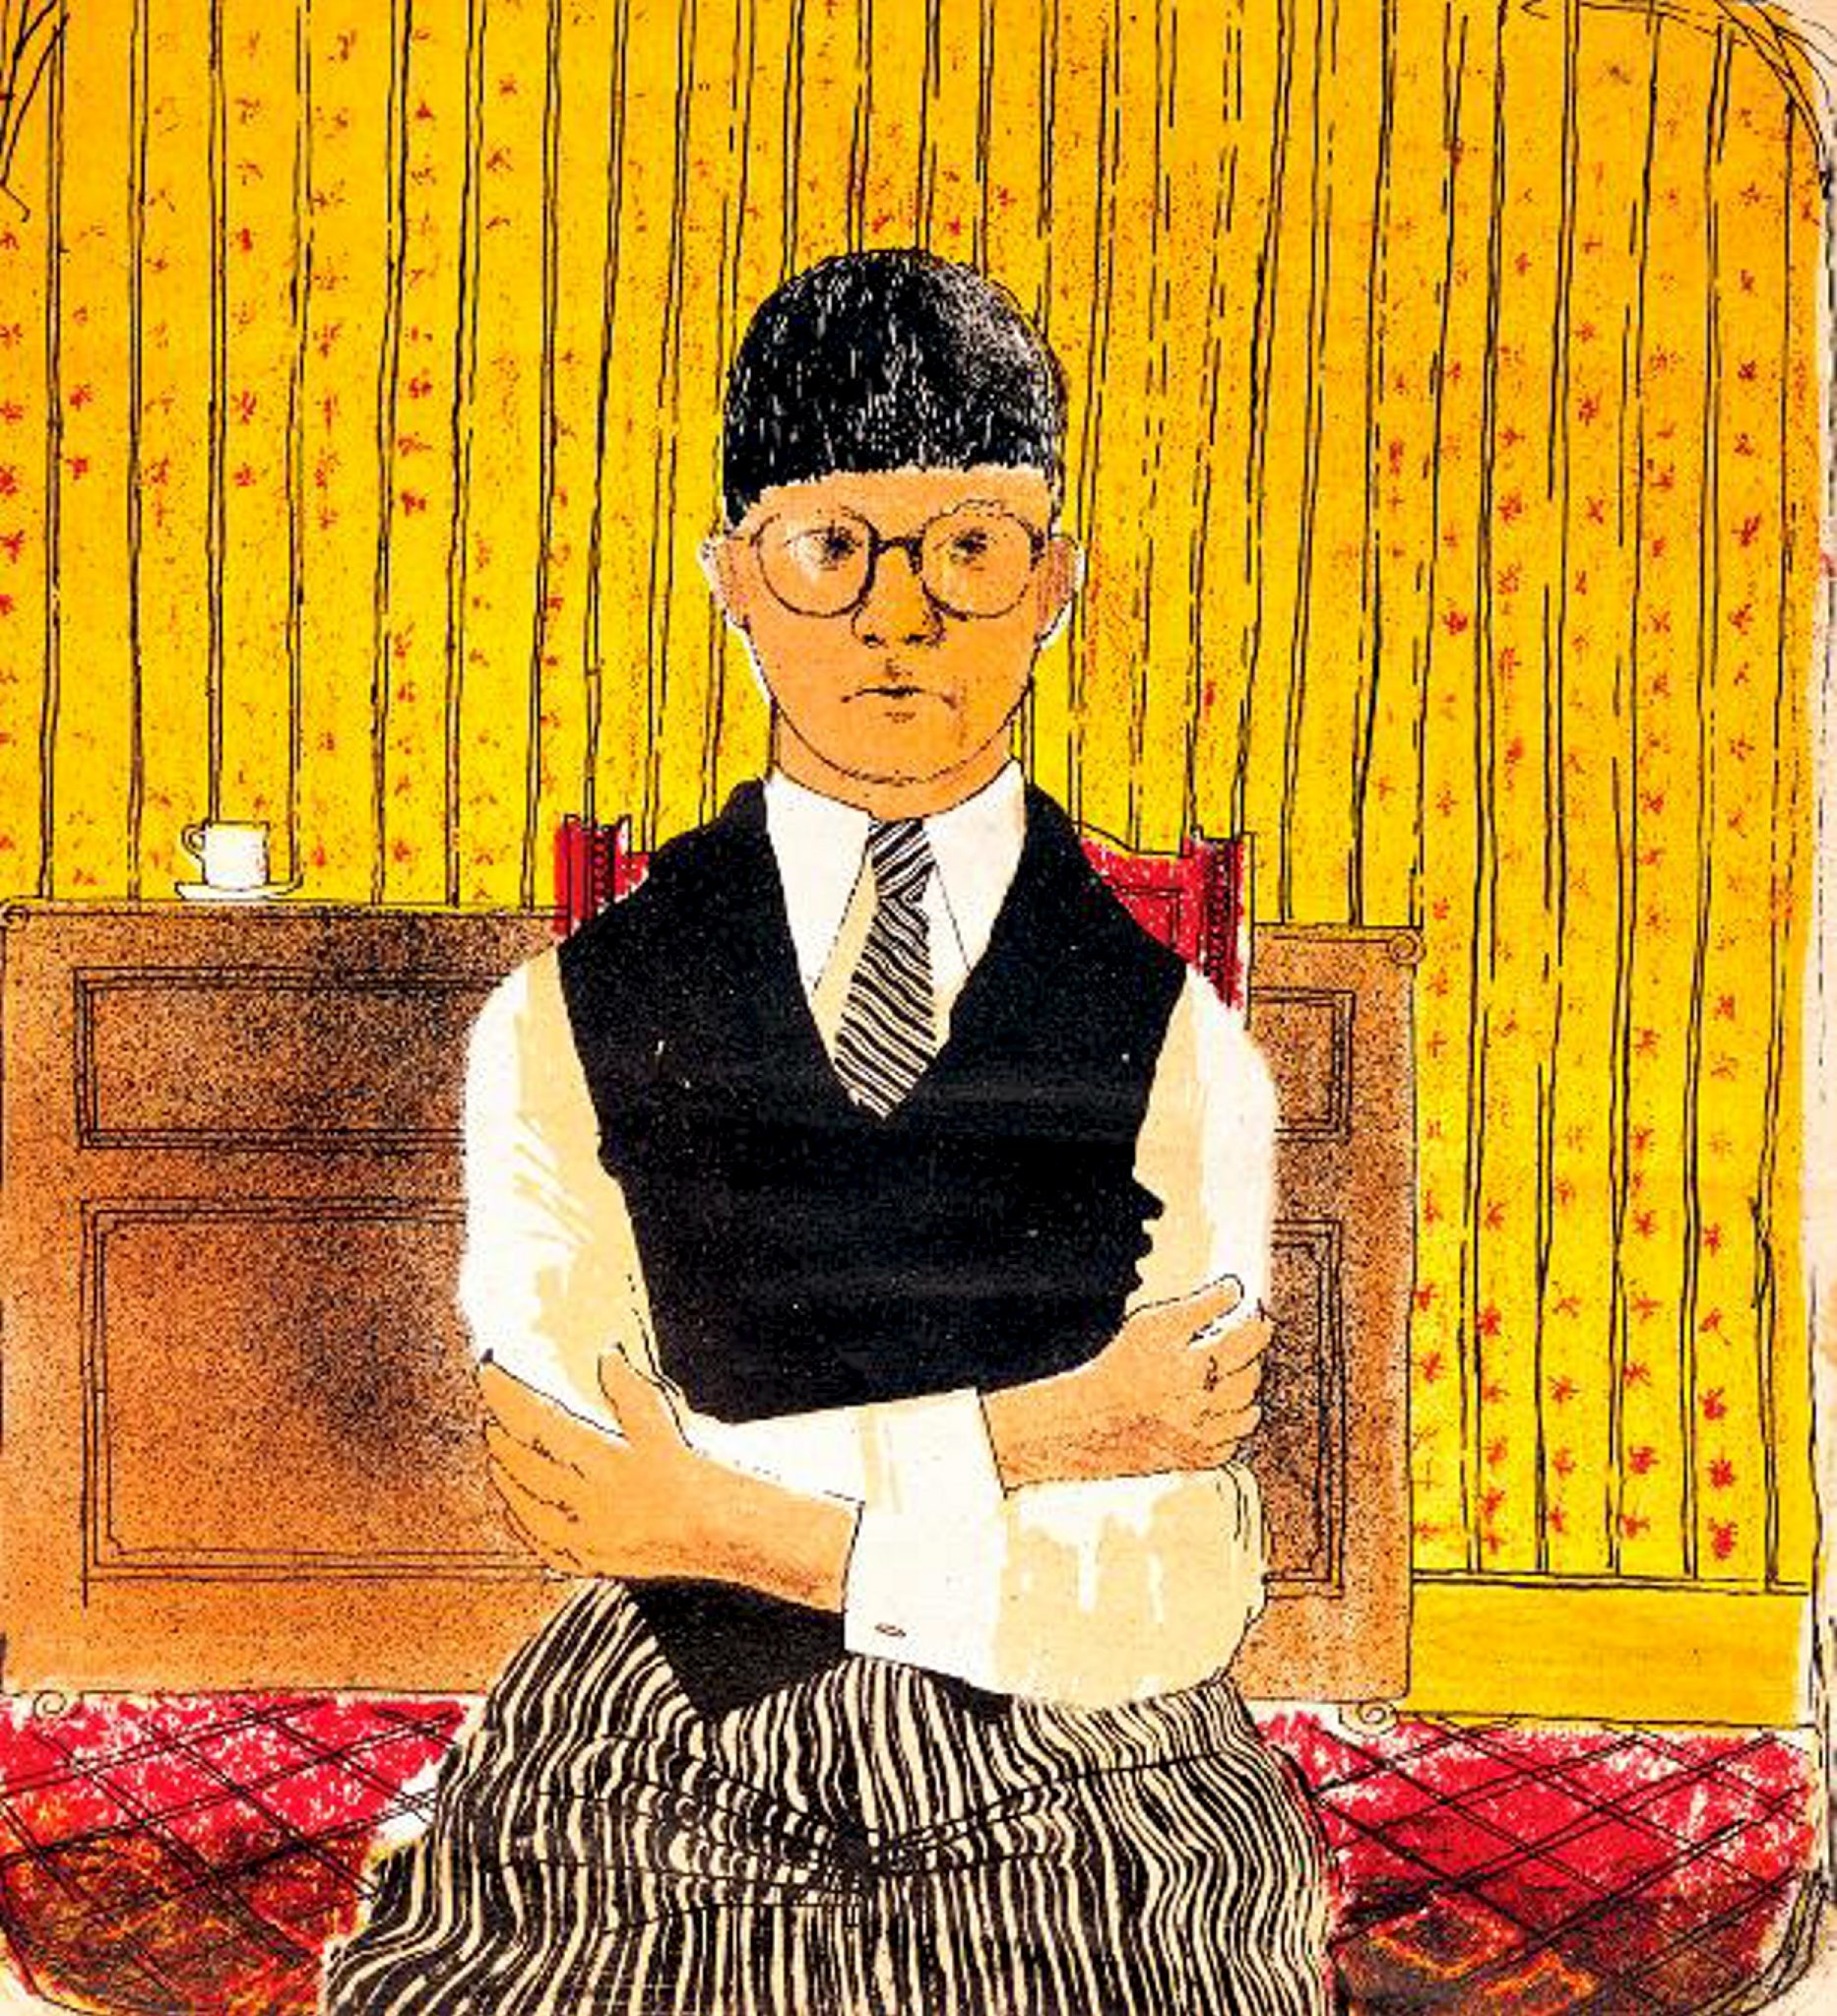 David Hockney at the RA